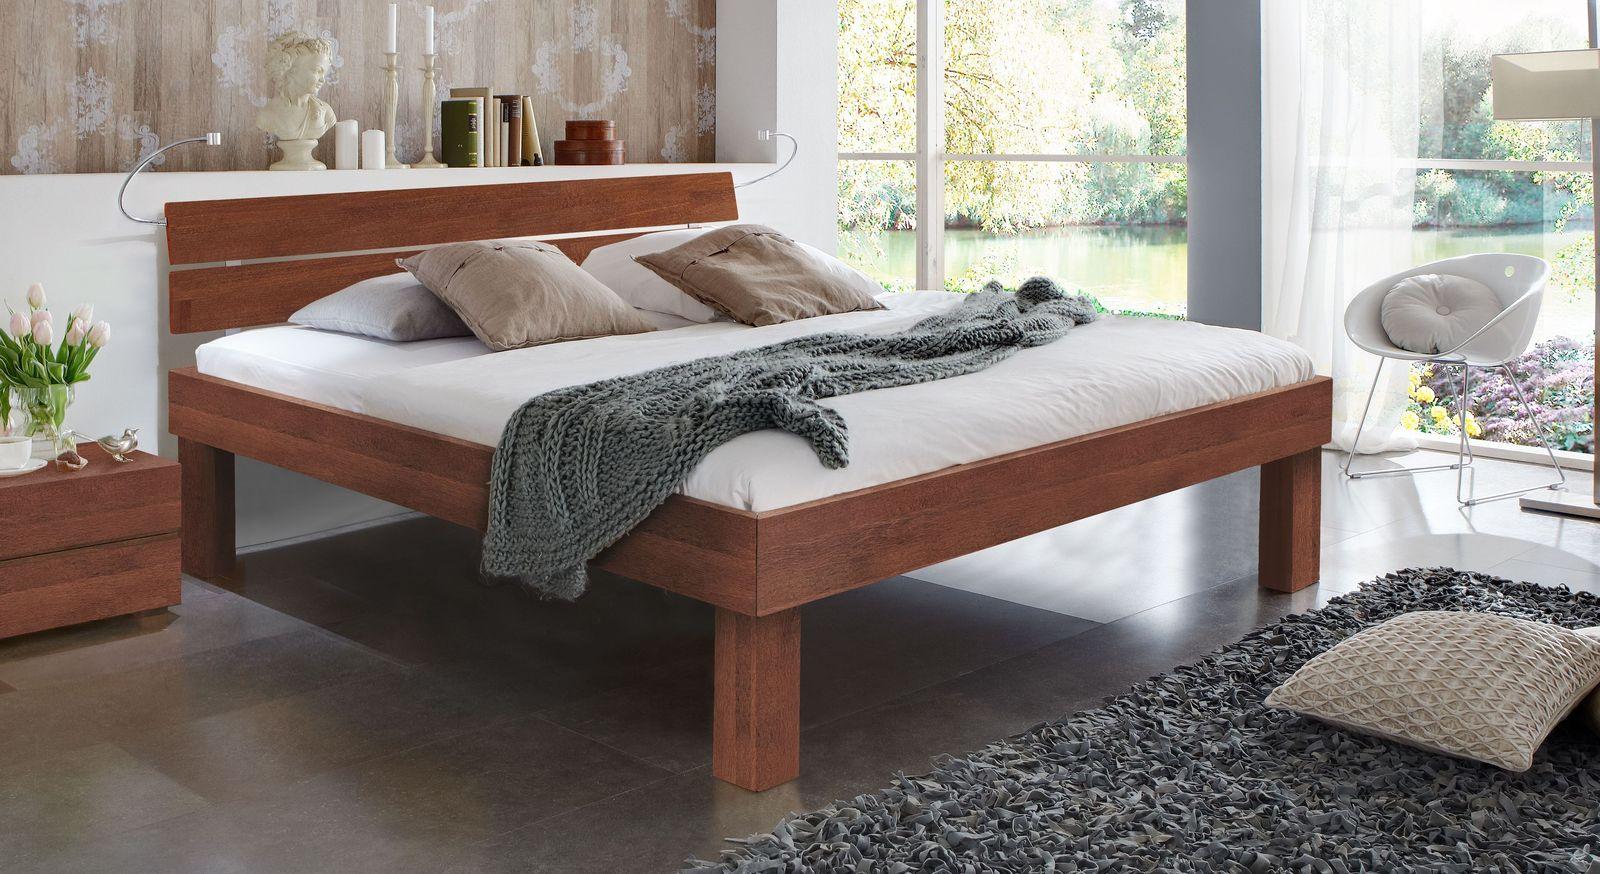 Kirschbaumfarbenes Doppelbett Madrid Komfort in 30 cm Höhe